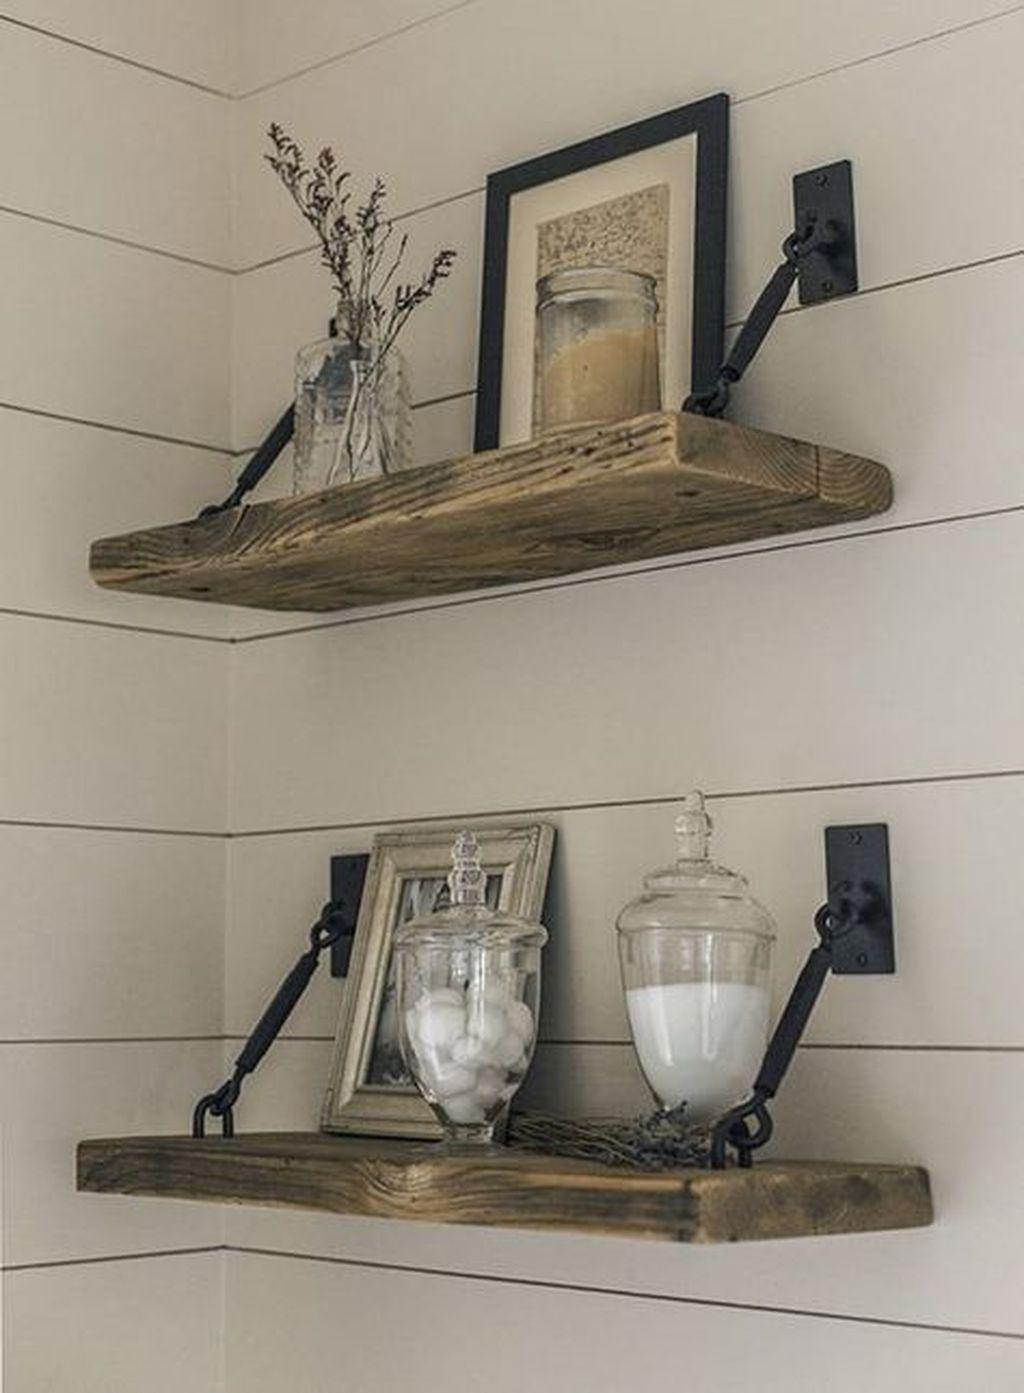 Awesome Diy Turnbuckle Shelf Ideas To Beautify Interior Decor09